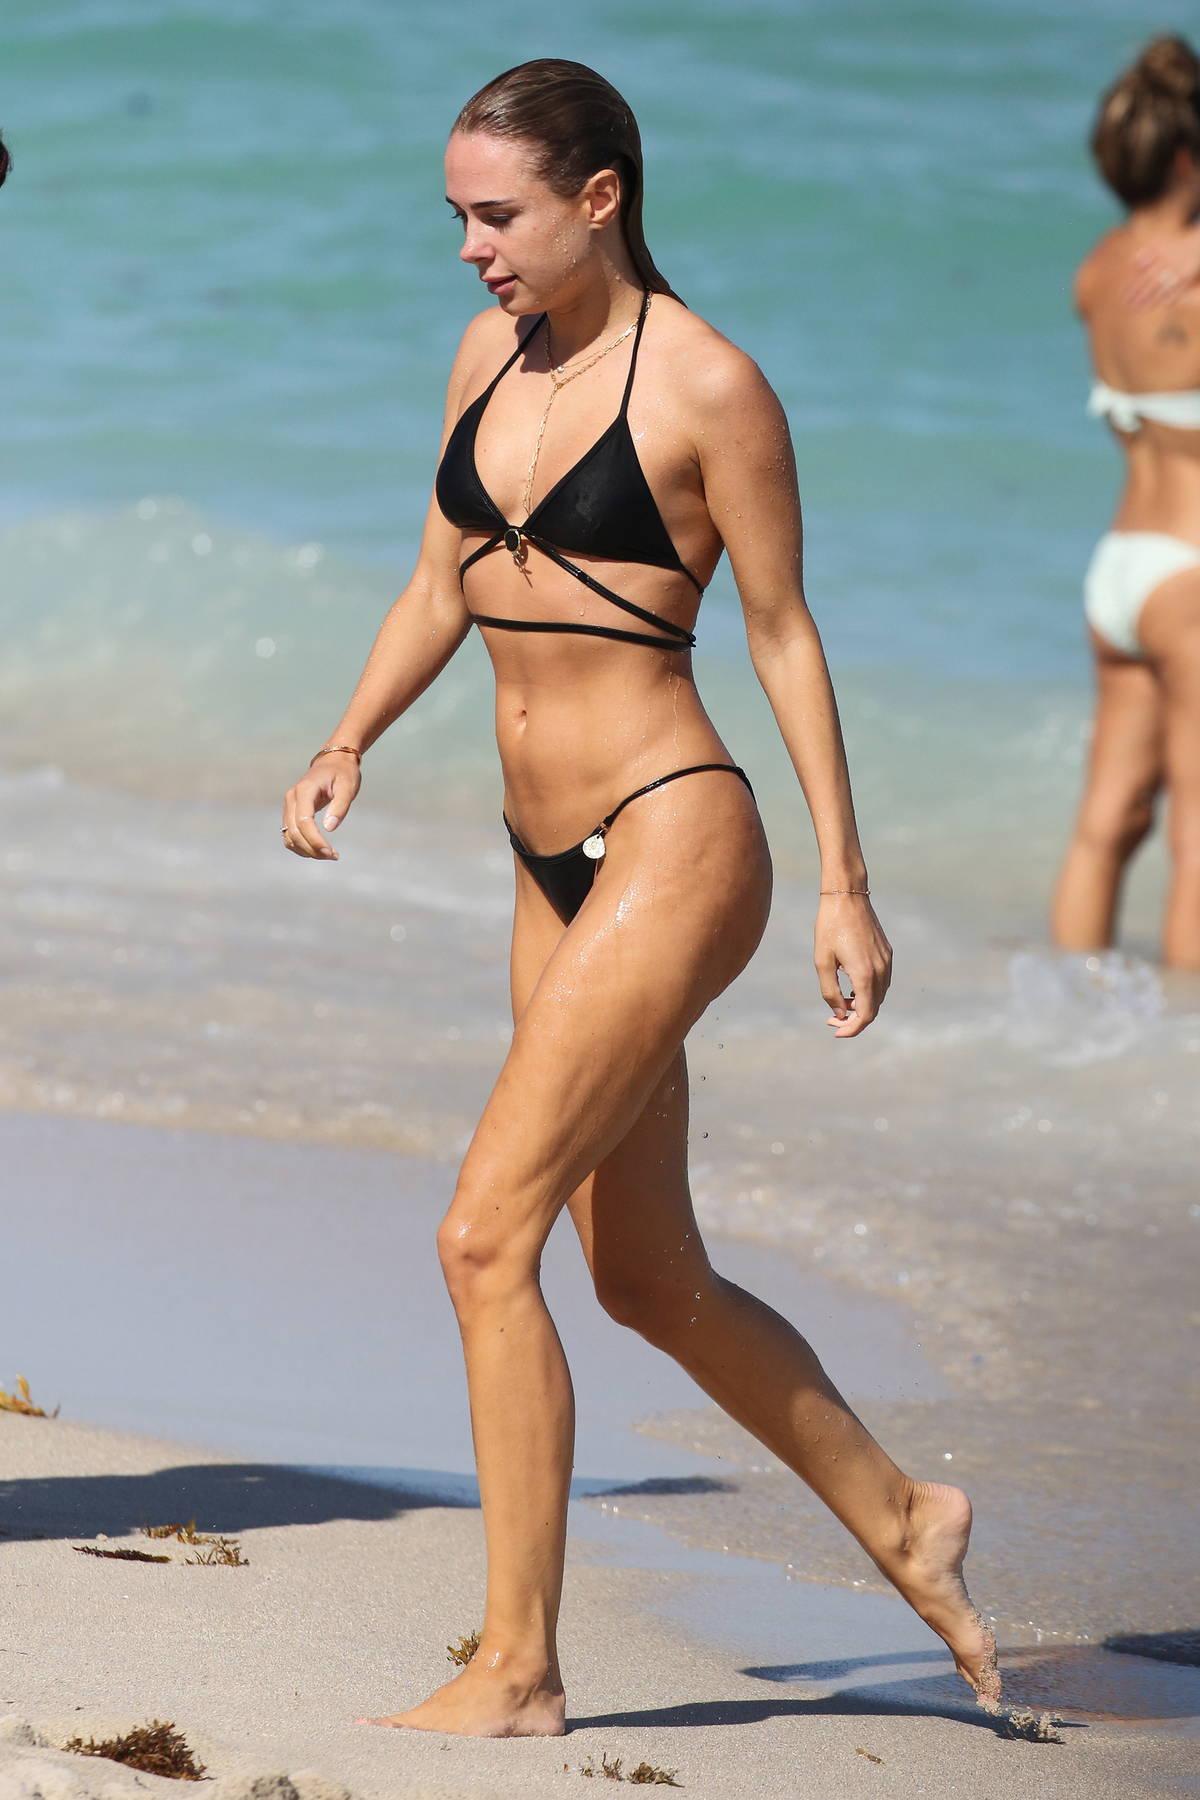 Kimberley Garner looks incredible in a black bikini as she hits the beach in Miami, Florida